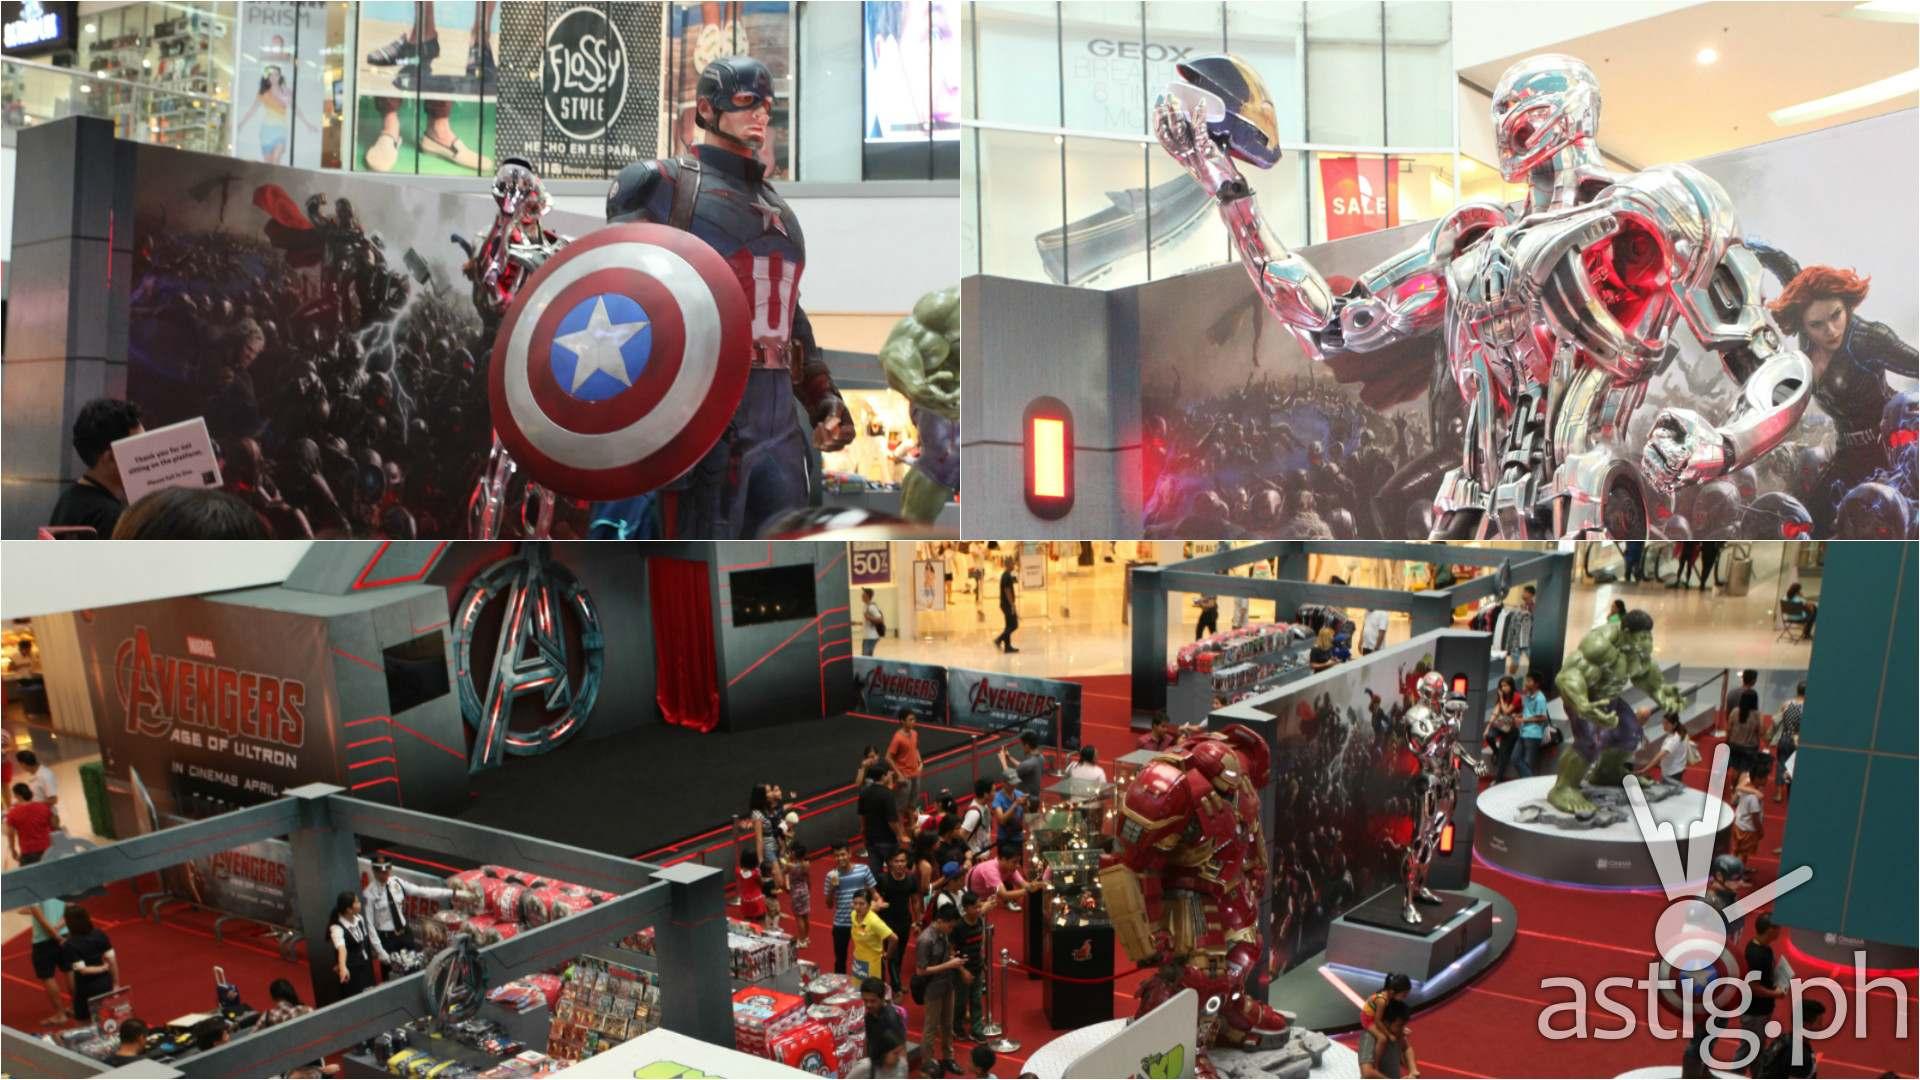 Avengers Age of Ultron exhibit Filbar's SM North EDSA